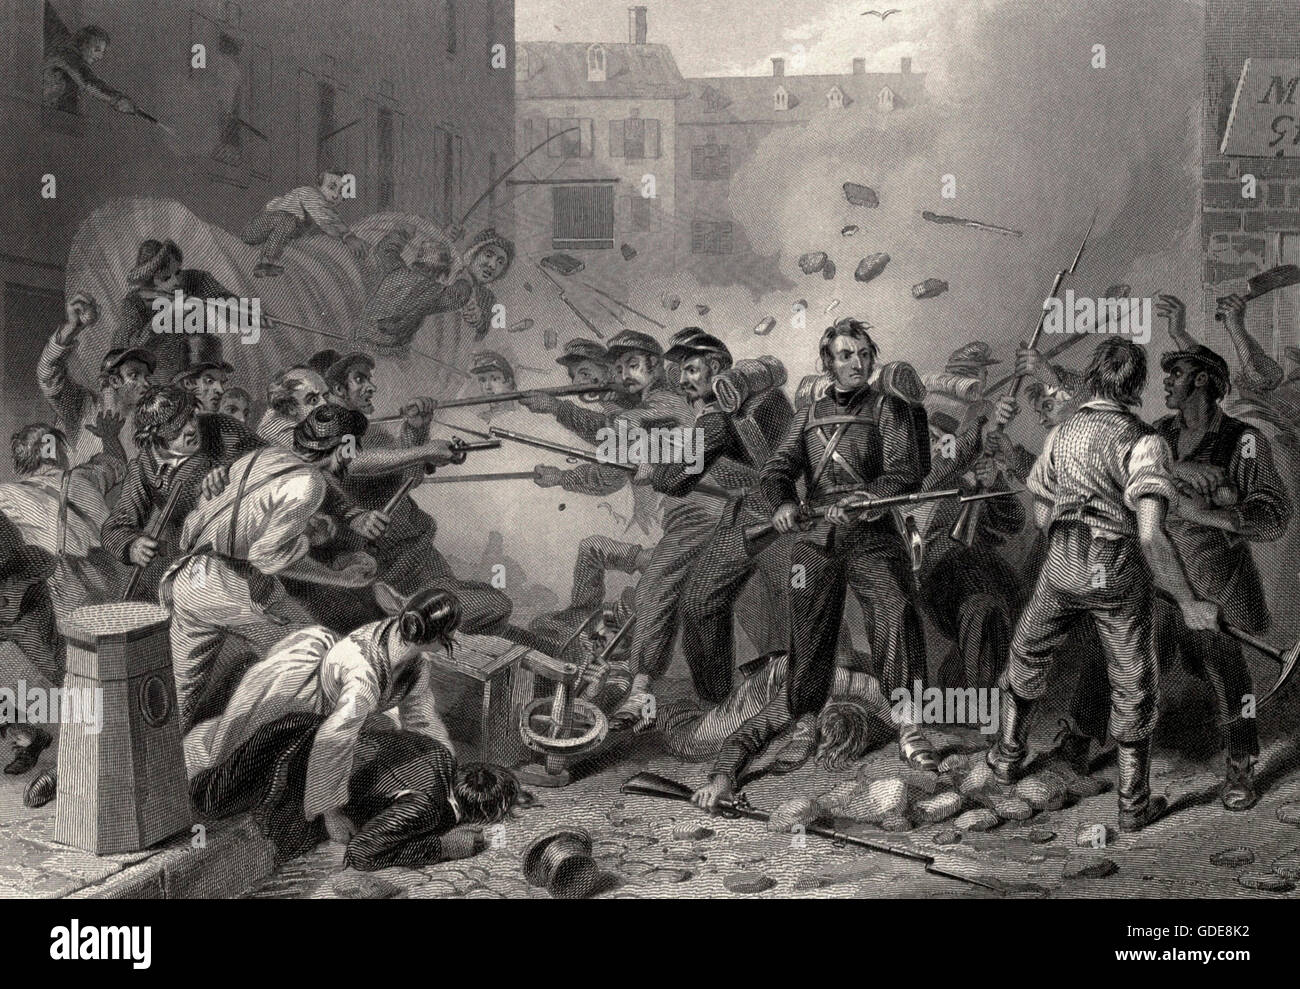 Massachusetts Militia passing through Baltimore, Maryland at the start of the USA Civil War, 1861 - Stock Image